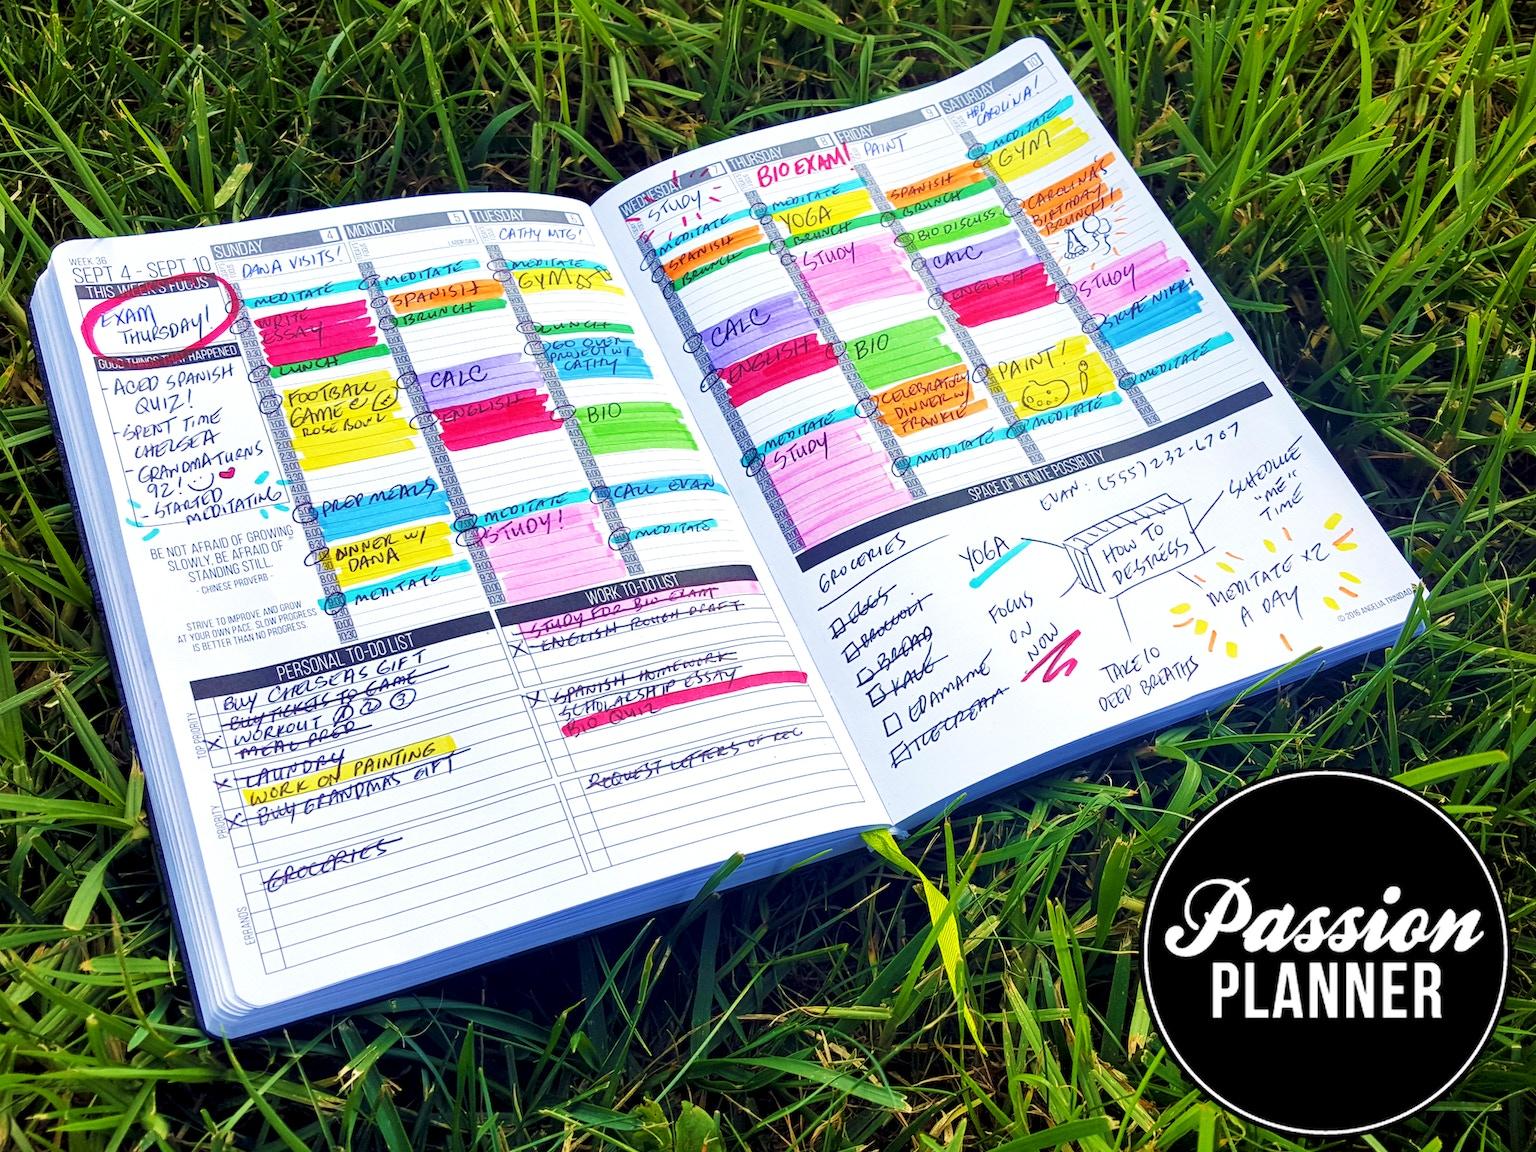 Kickstarter Calendar Planner : Passion planner get one give by angelia trinidad